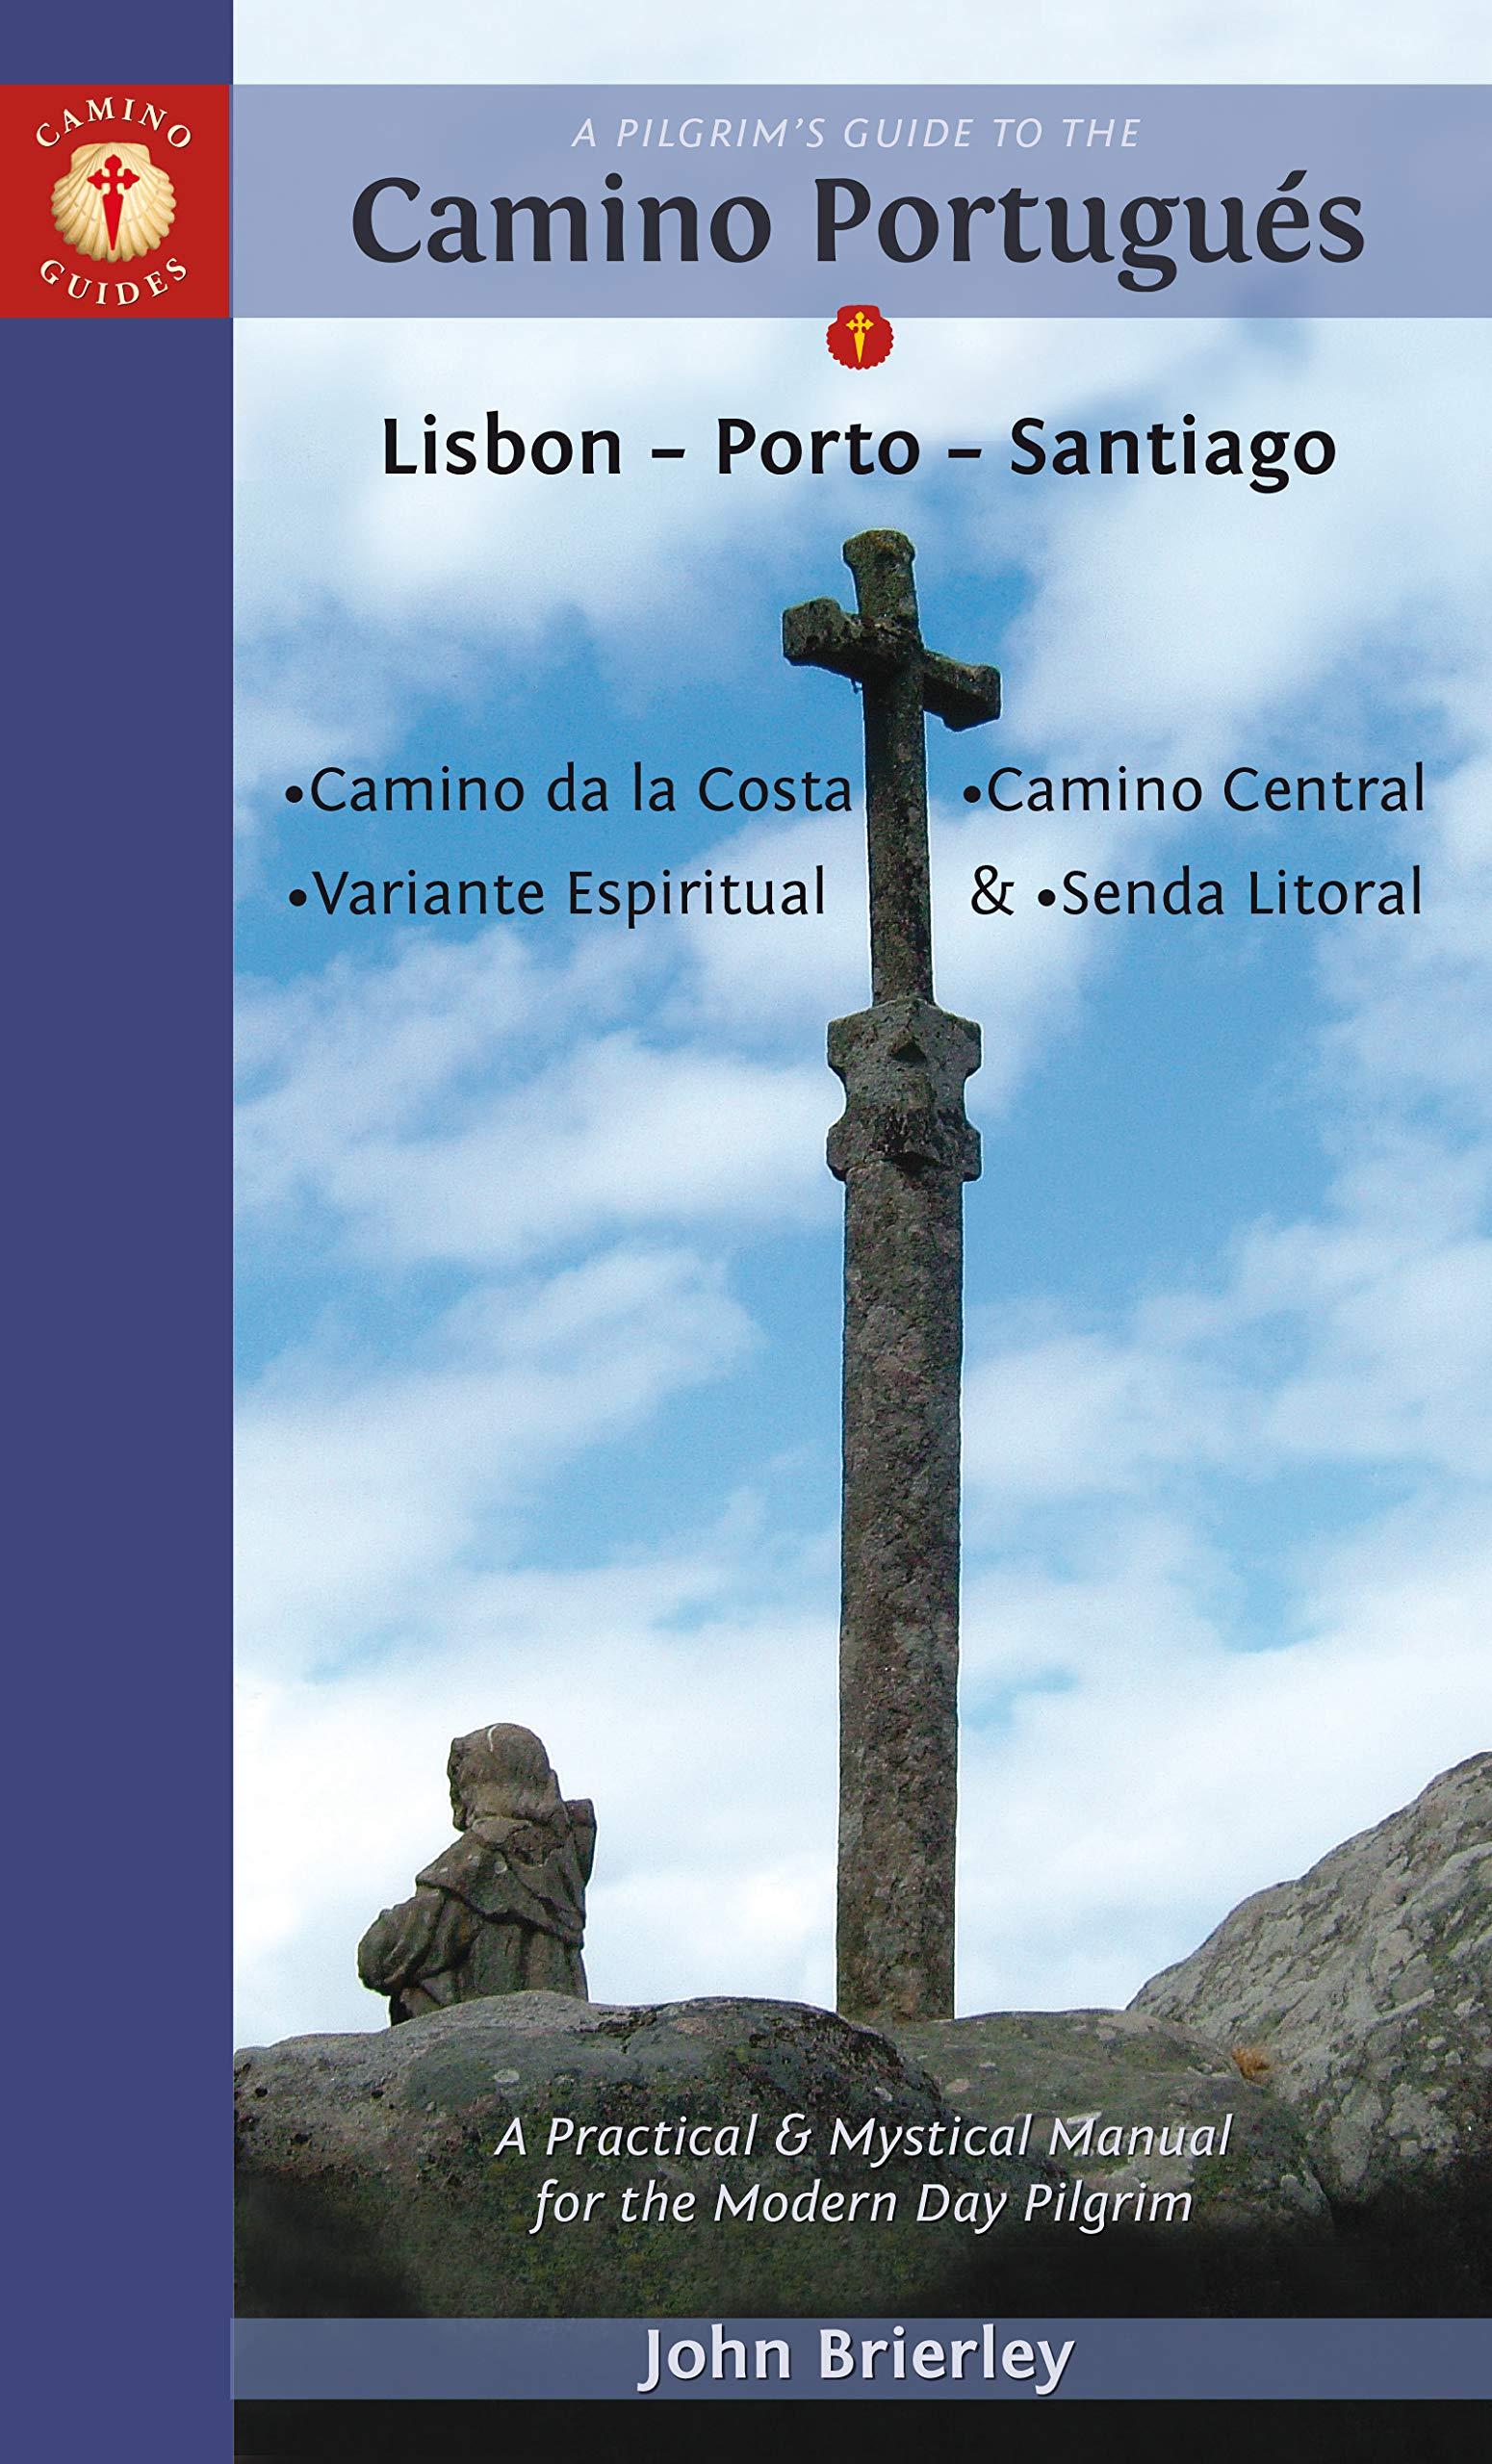 A Pilgrim's Guide to the Camino Portugués: Lisbon - Porto - Santiago / Camino Central, Camino de la Costa, Variente Espiritual & Senda Litoral (Camino Guides) by Camino Guides